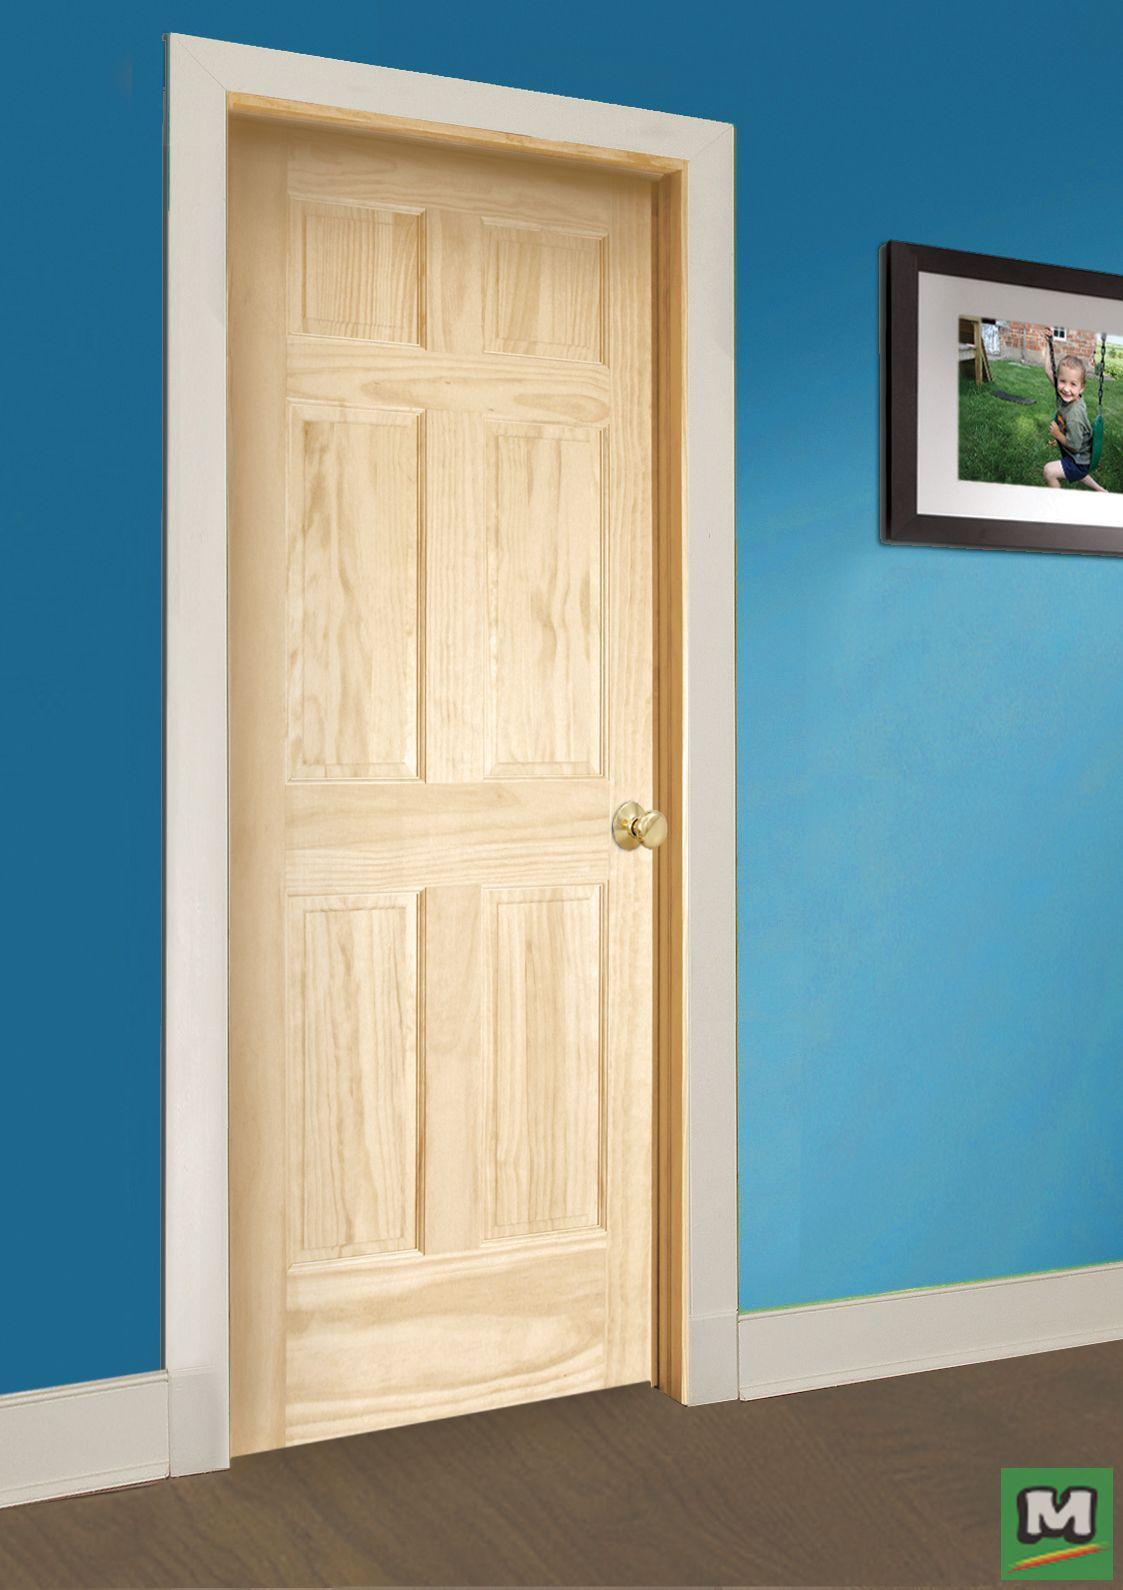 This Mastercraft Ready To Finish Pine 6 Panel Prehung Interior Door